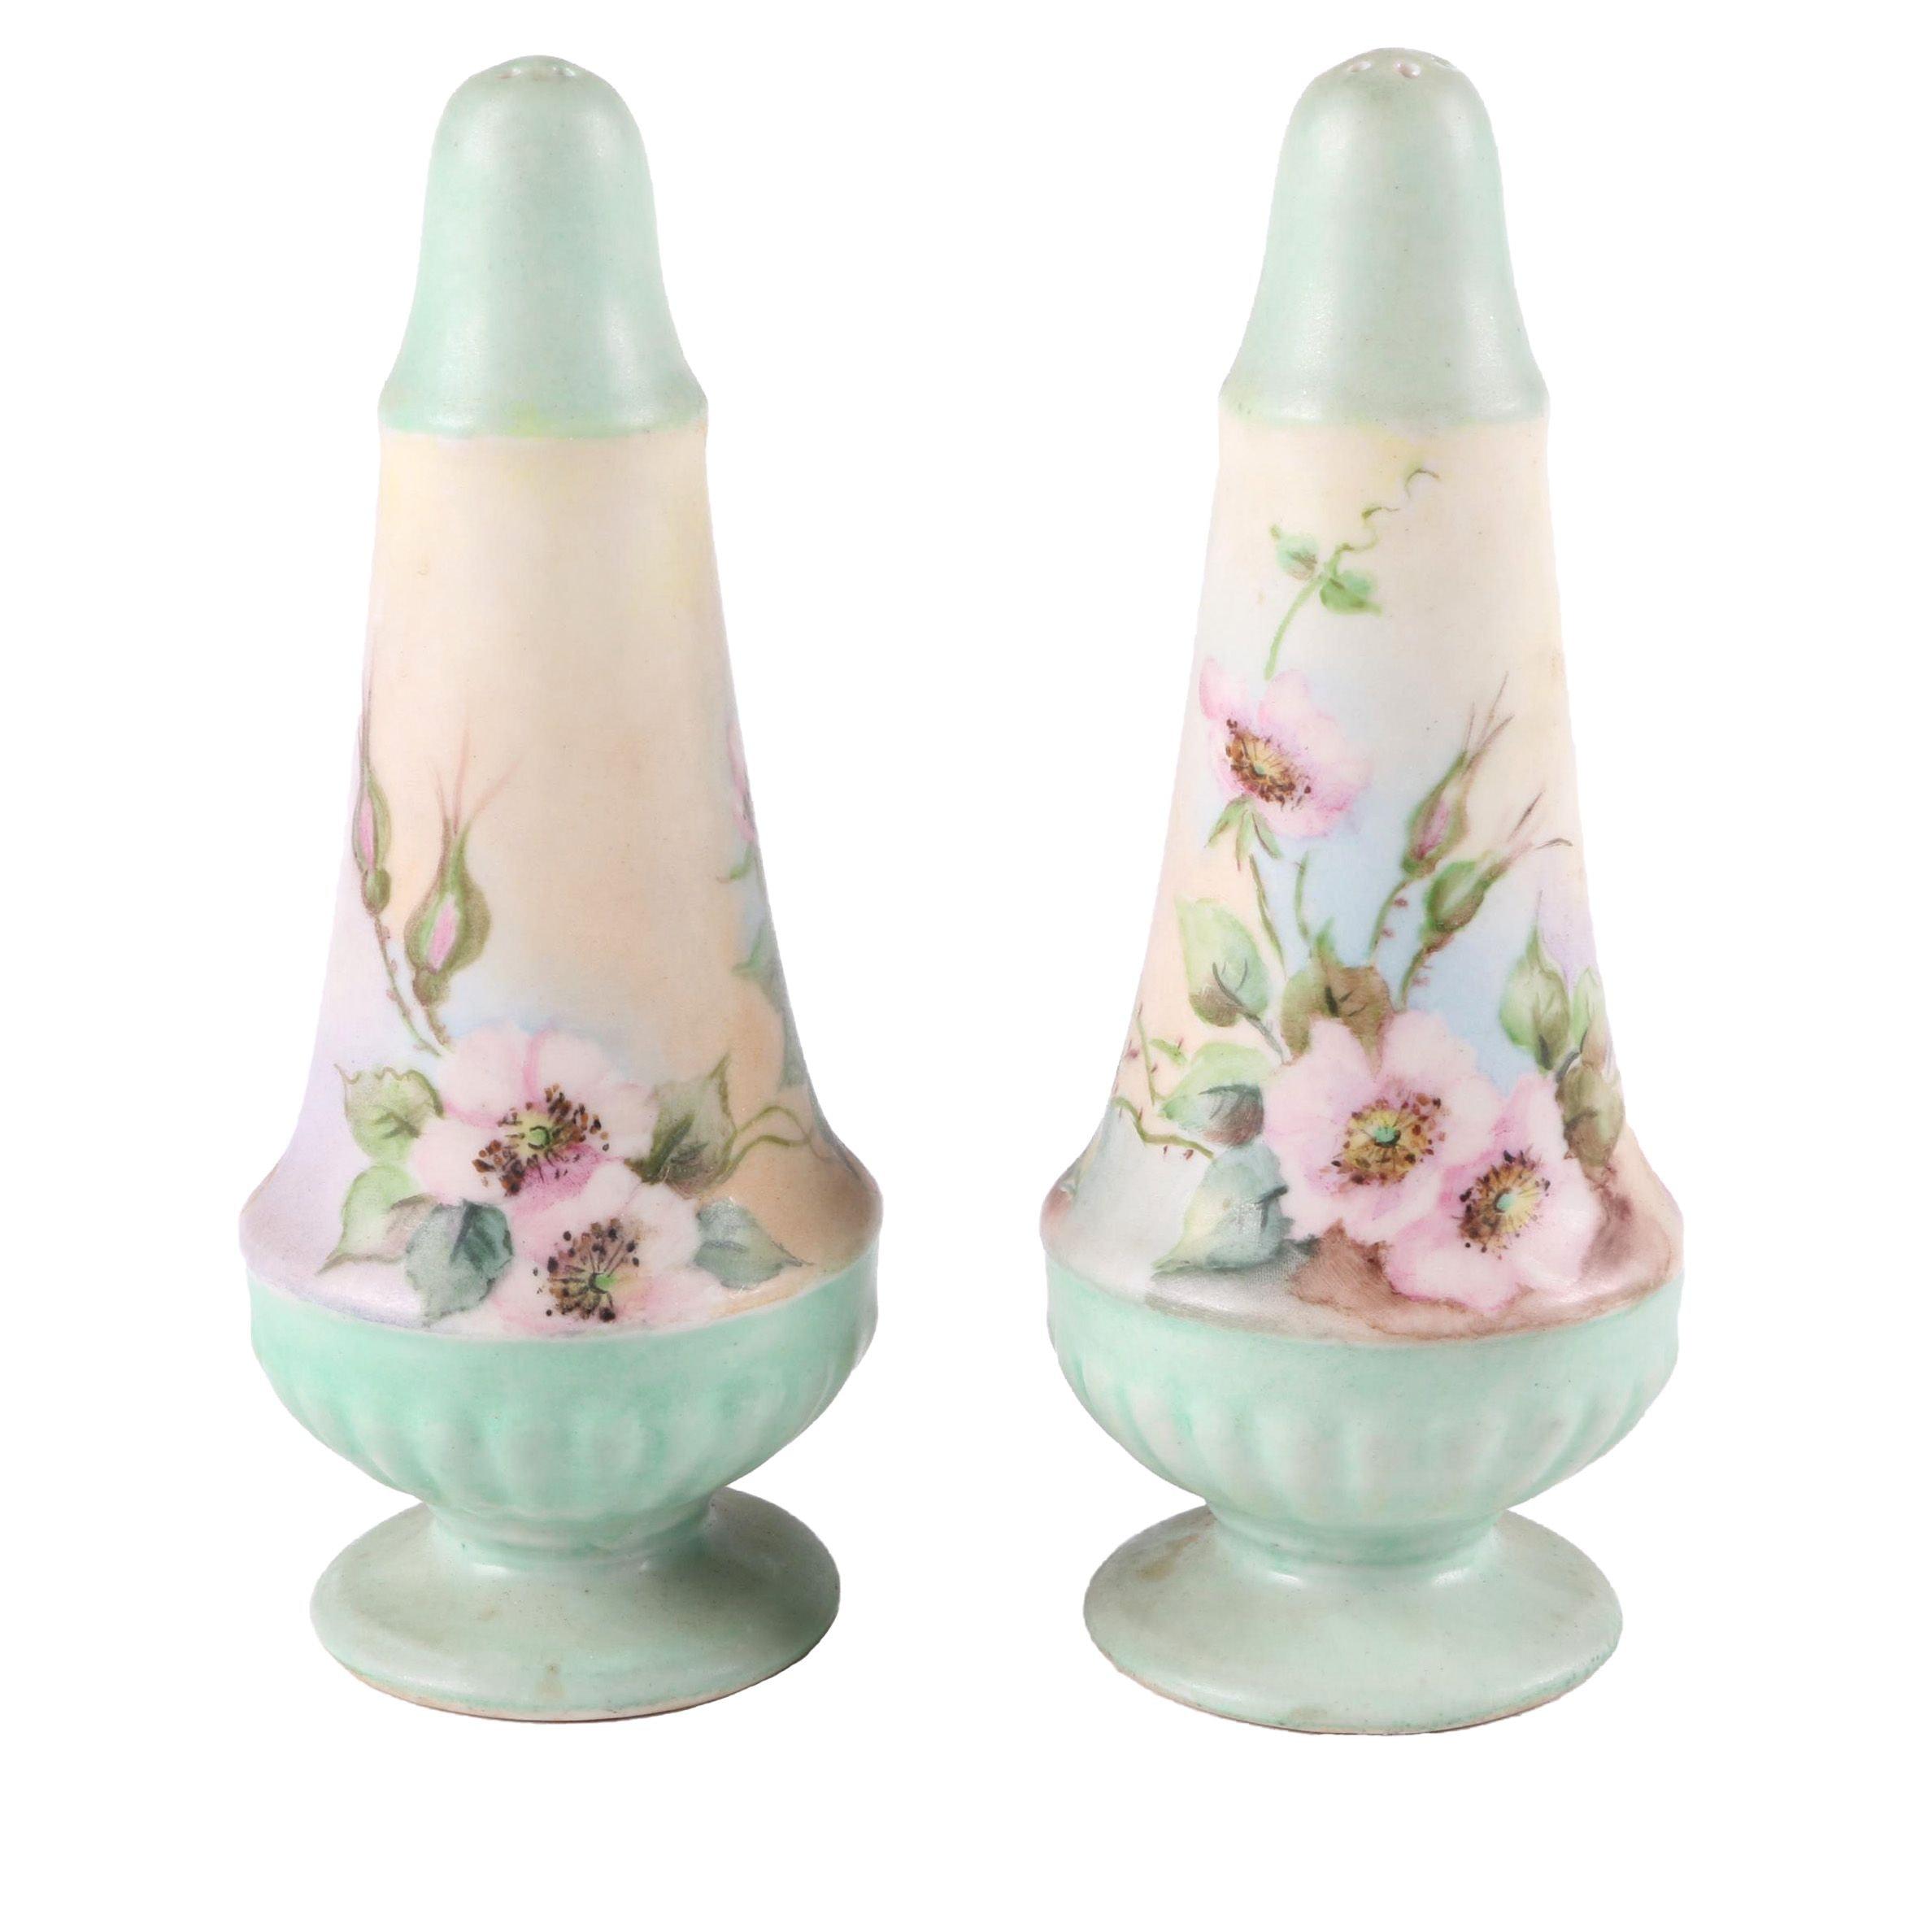 Pastel Floral Motif Ceramic Casters